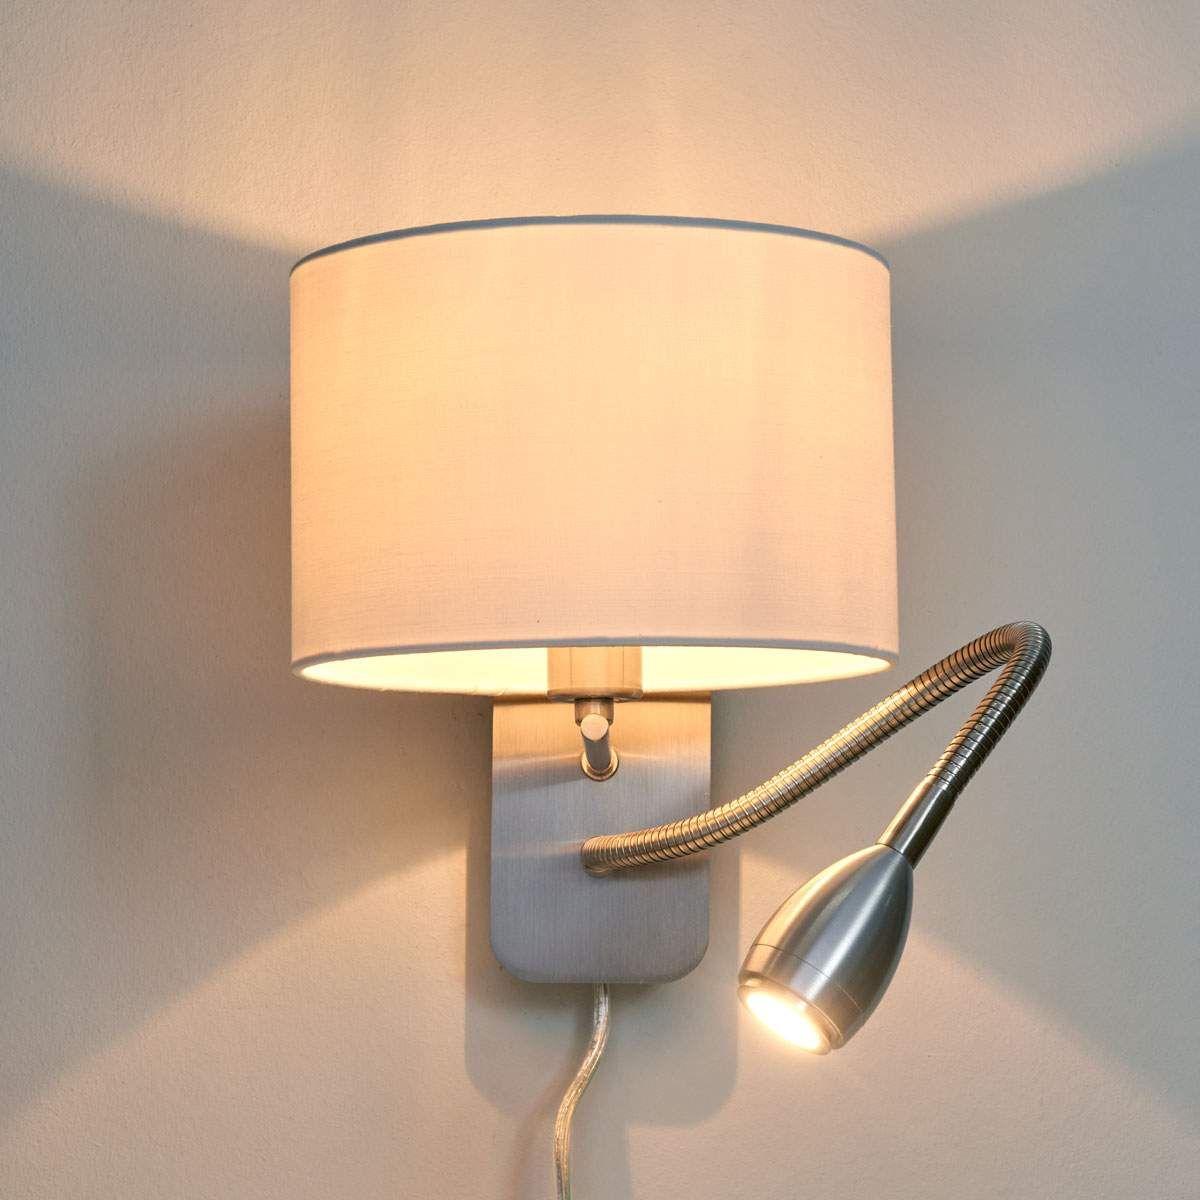 Risa - kombinierte Wandleuchte mit Leselampe  Wandlampen